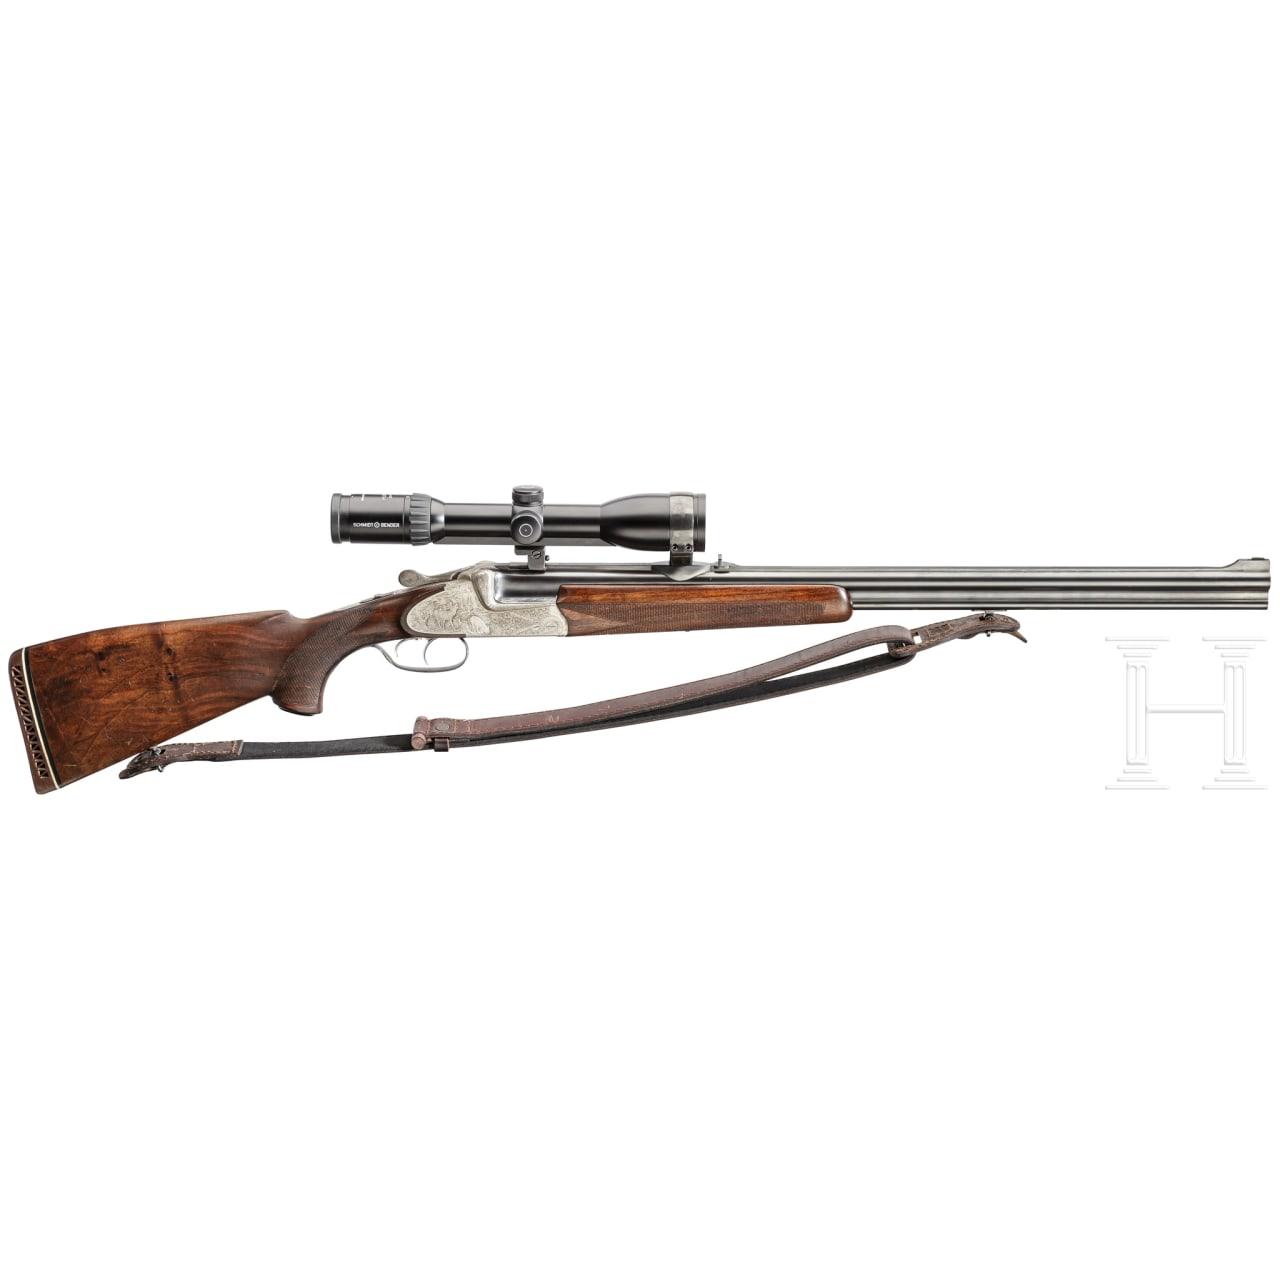 An over-and-under Scheiring-Düsel combination rifle with insert barrel and Schmidt & Bender scope